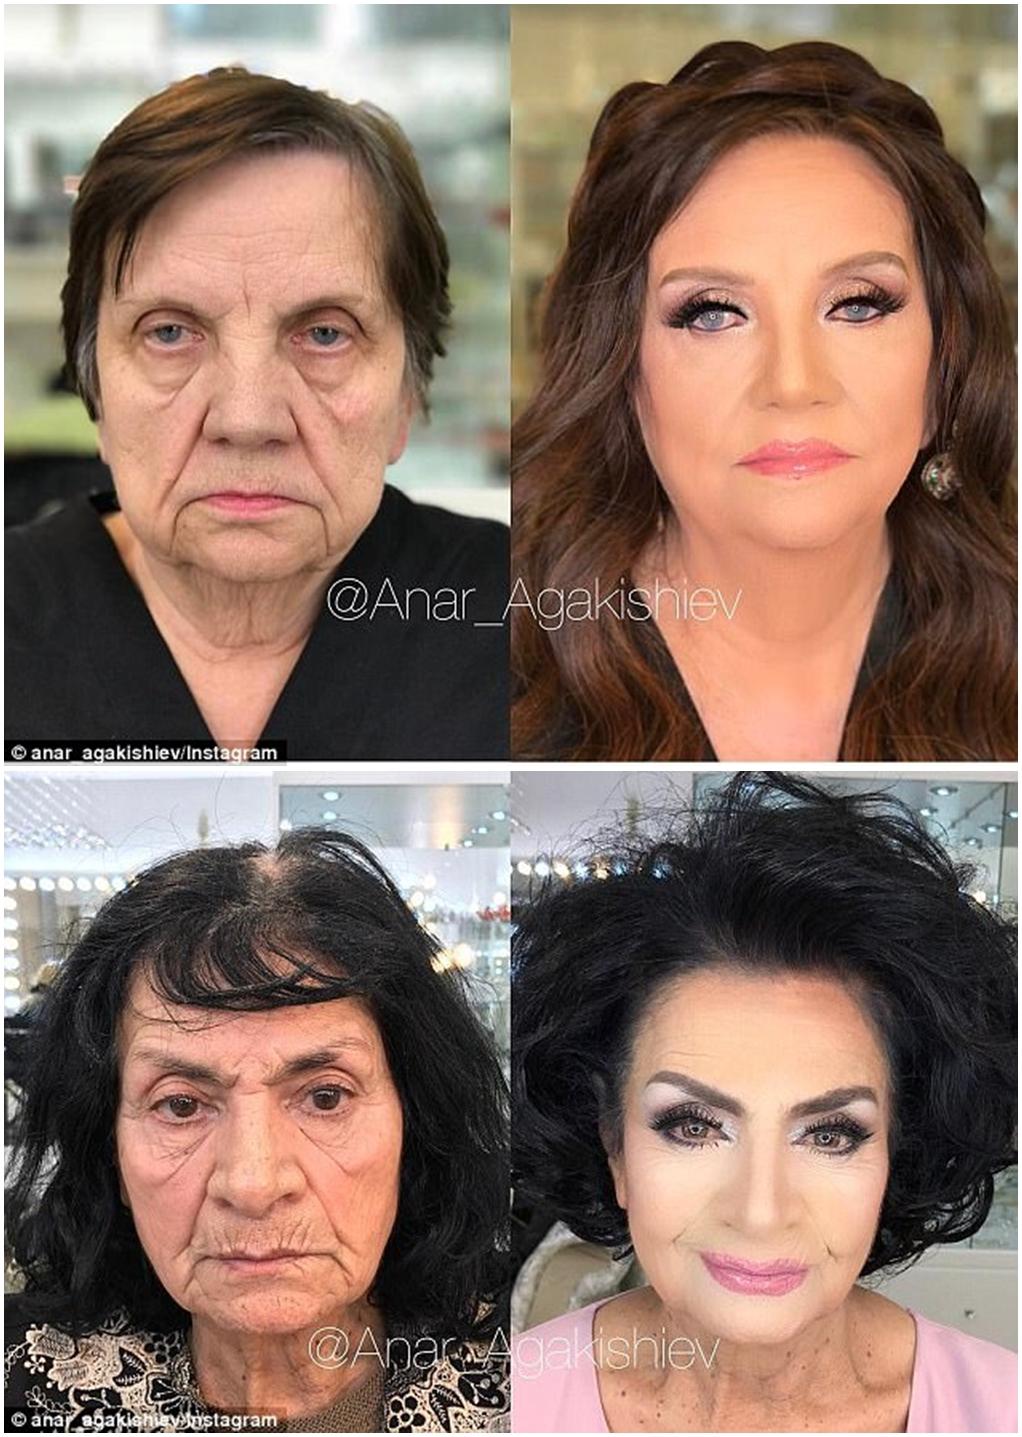 Anar Agakishiev transformations